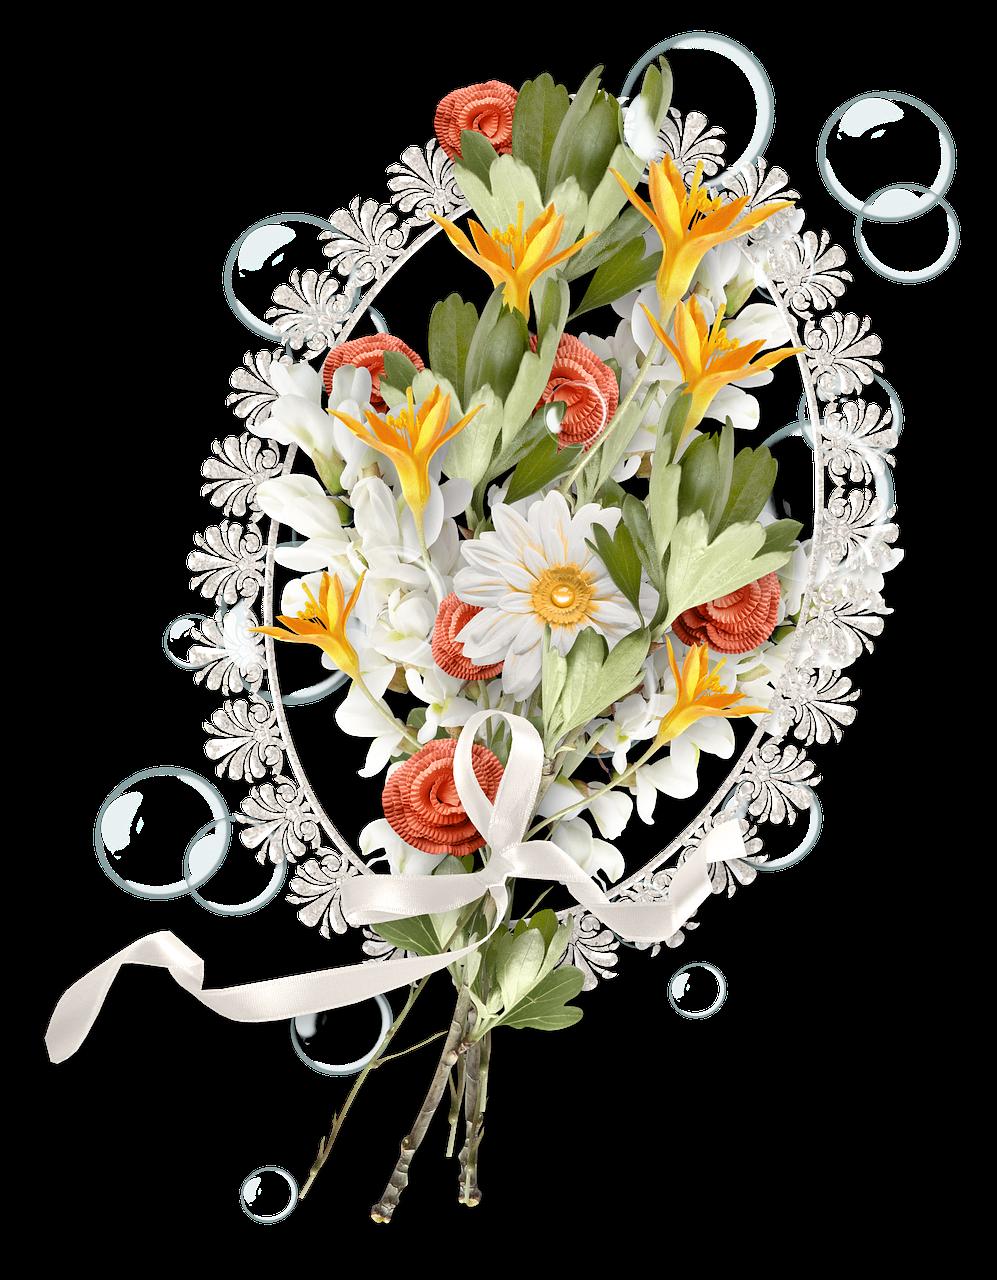 Crocheted flower bouquet.